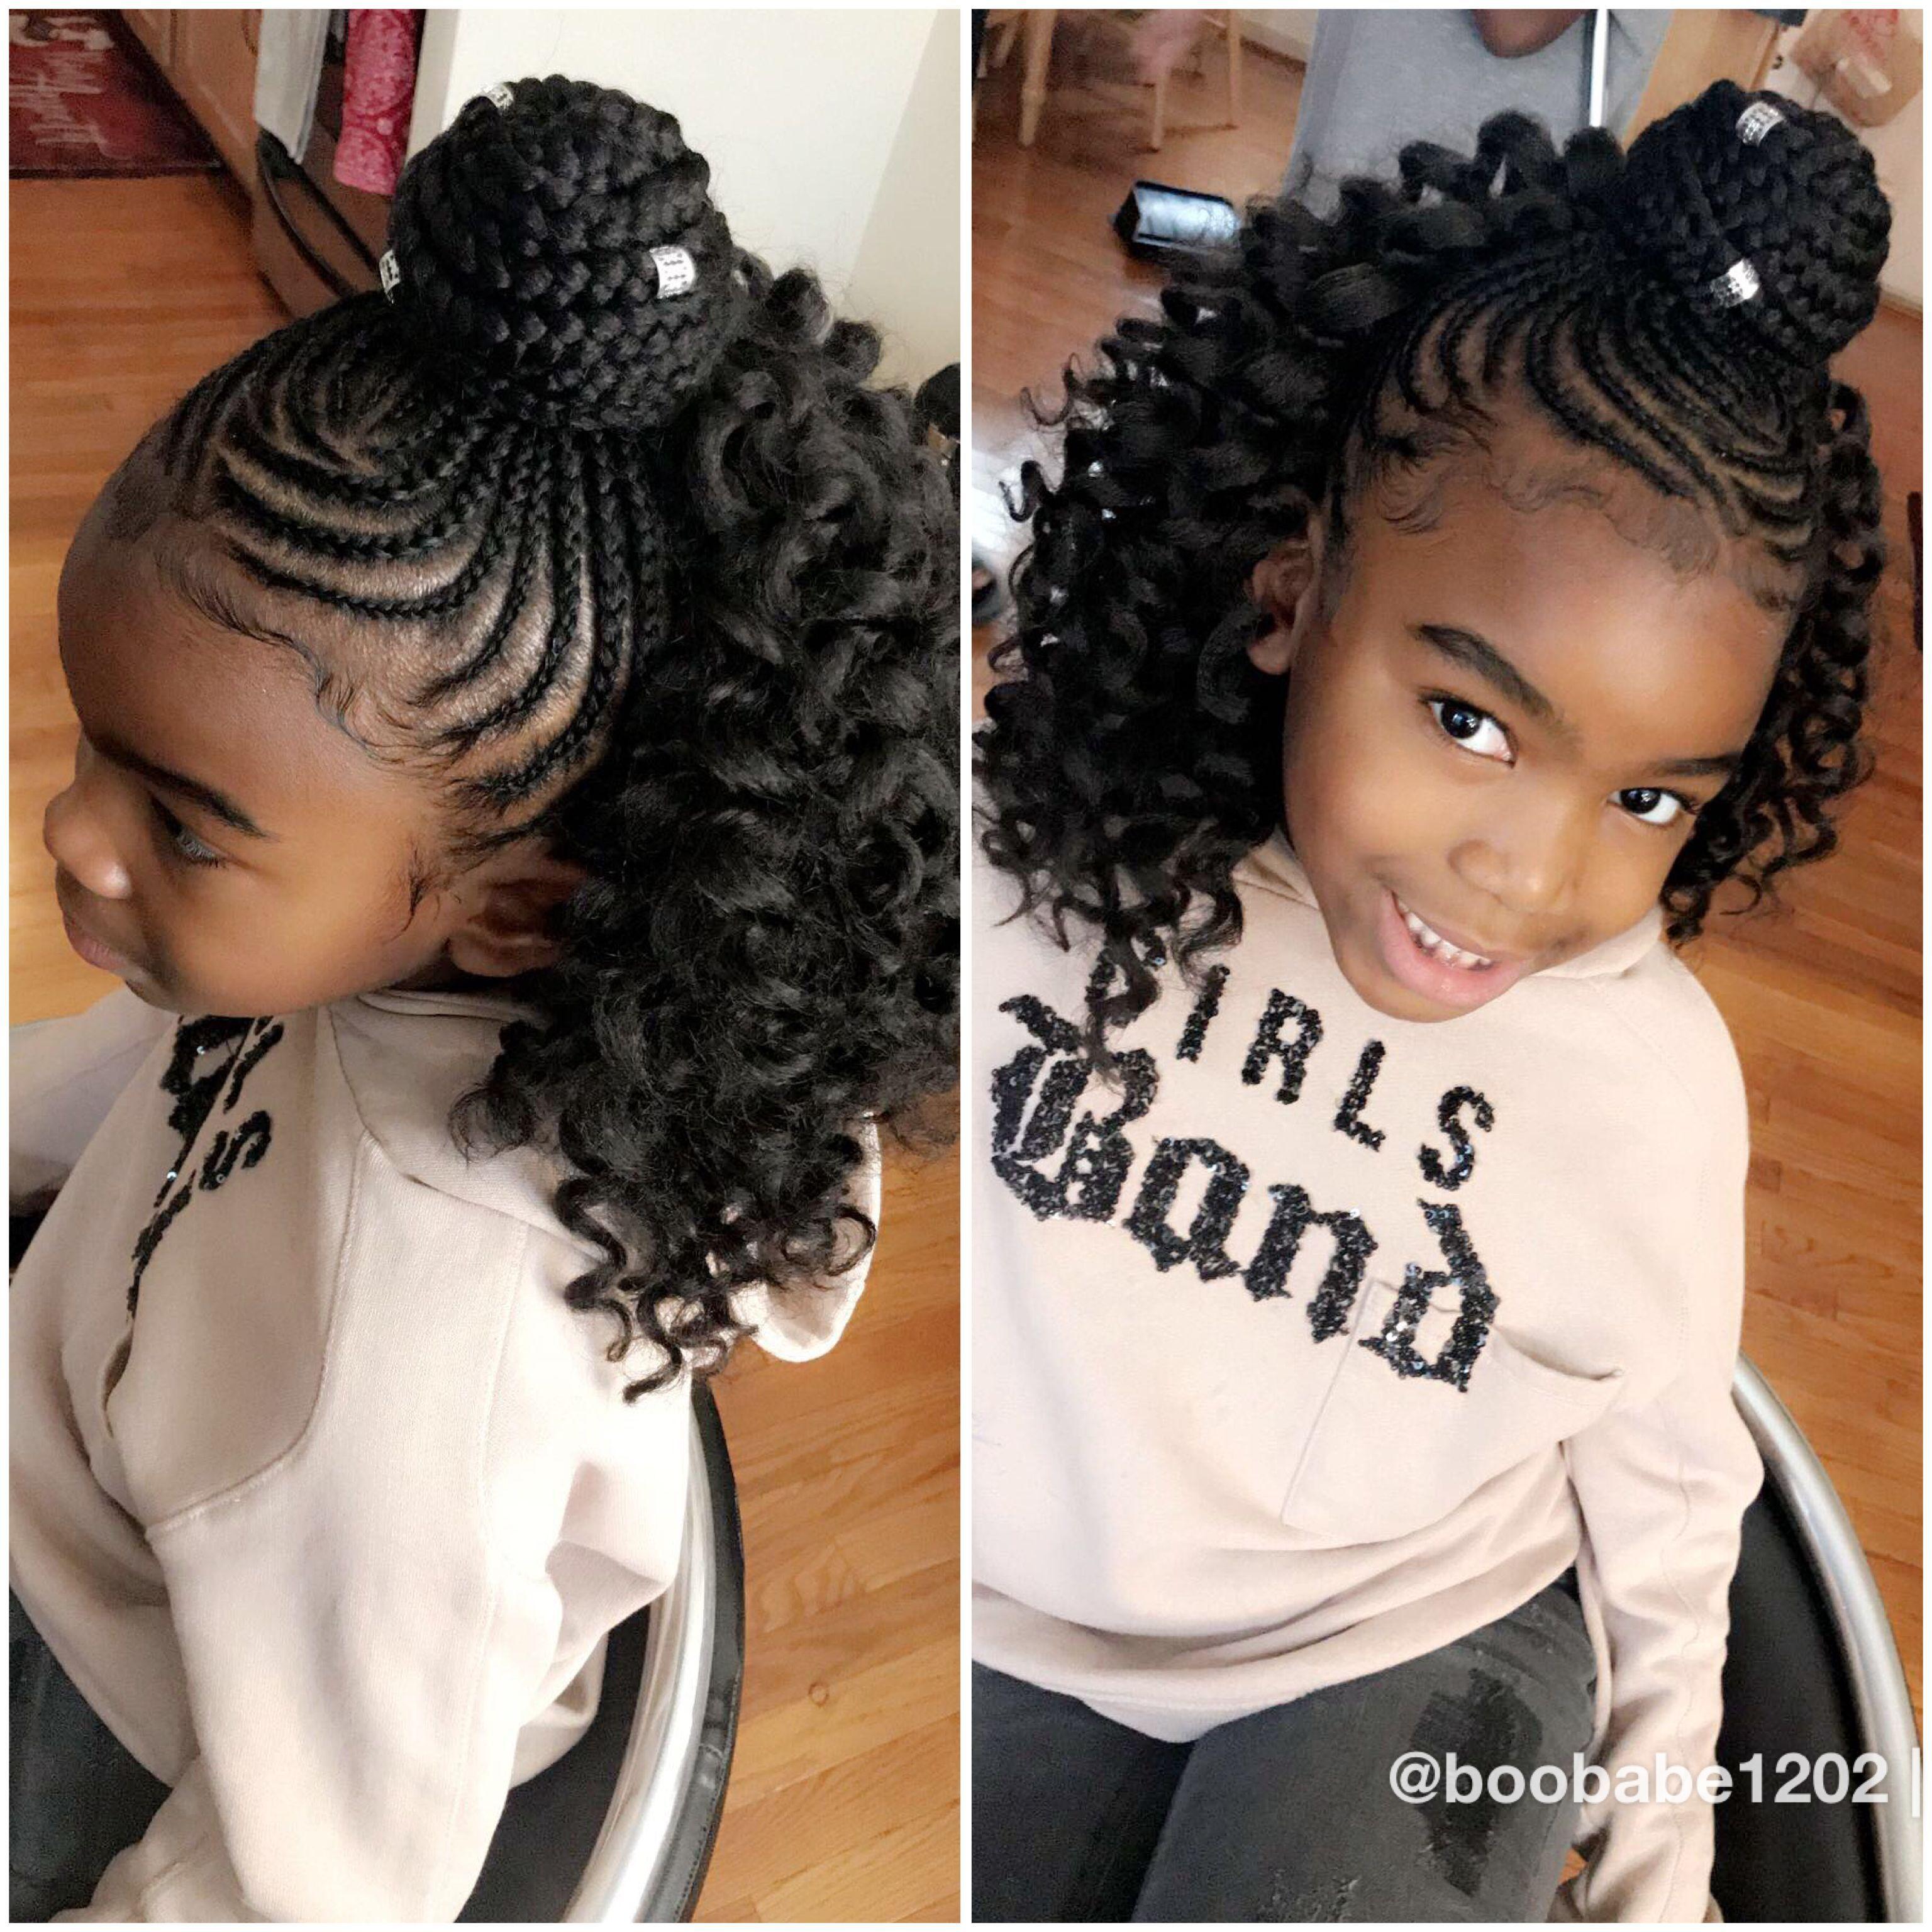 hairstyles | girls hair & fashions | kids braided hairstyles